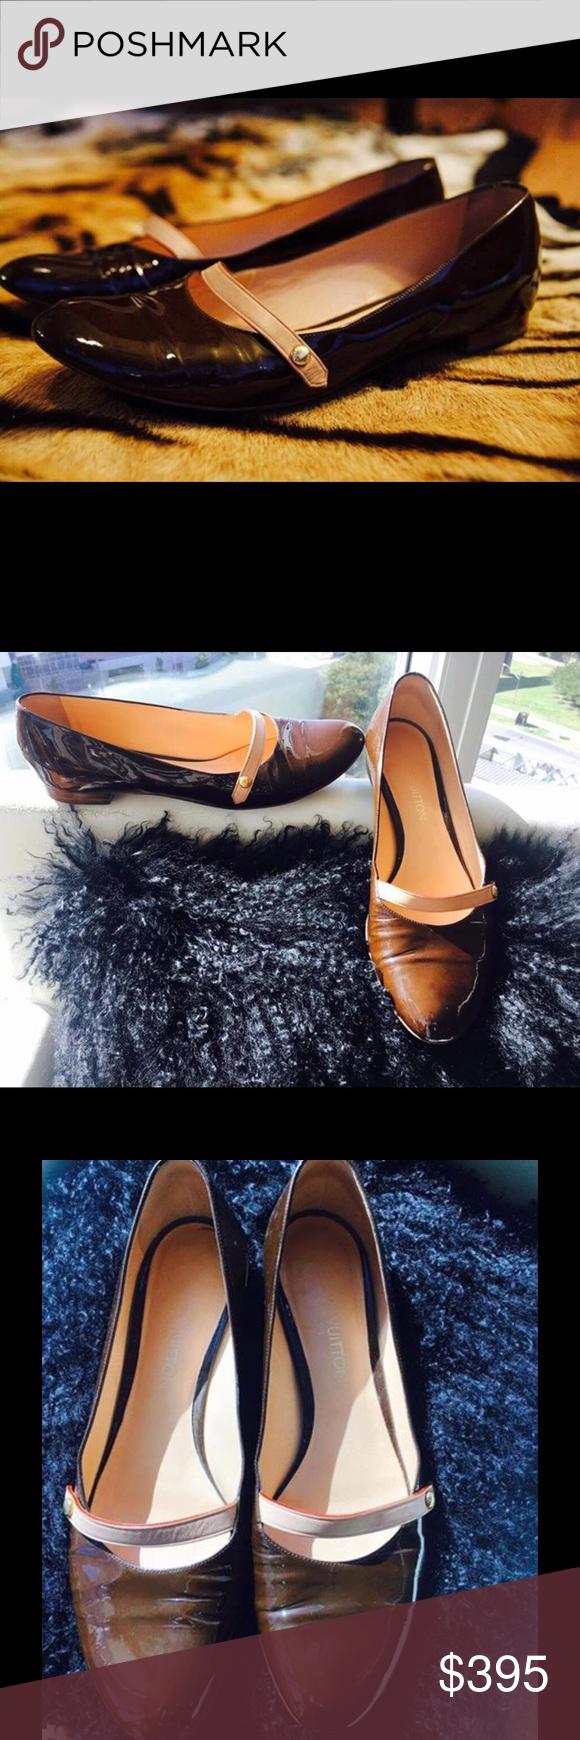 a4660a5d43d5 Louis Vuitton Ballerina Flats Size 11 Euro  41 US  9 Brown and tan